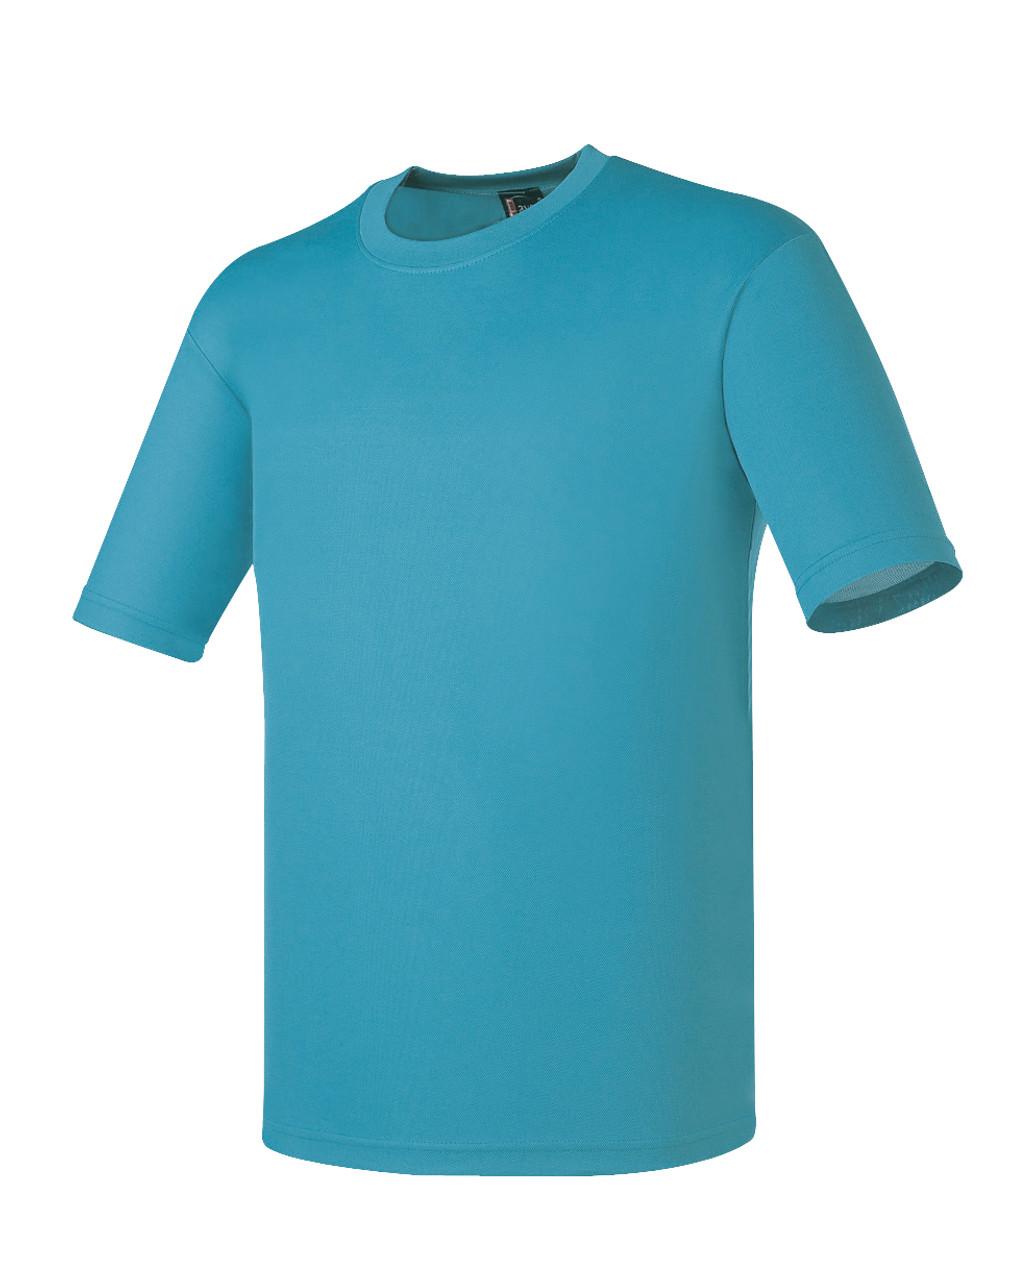 Bcpolo round t shirt aqua round t shirt dri fit t shirt for Dri fit material shirts